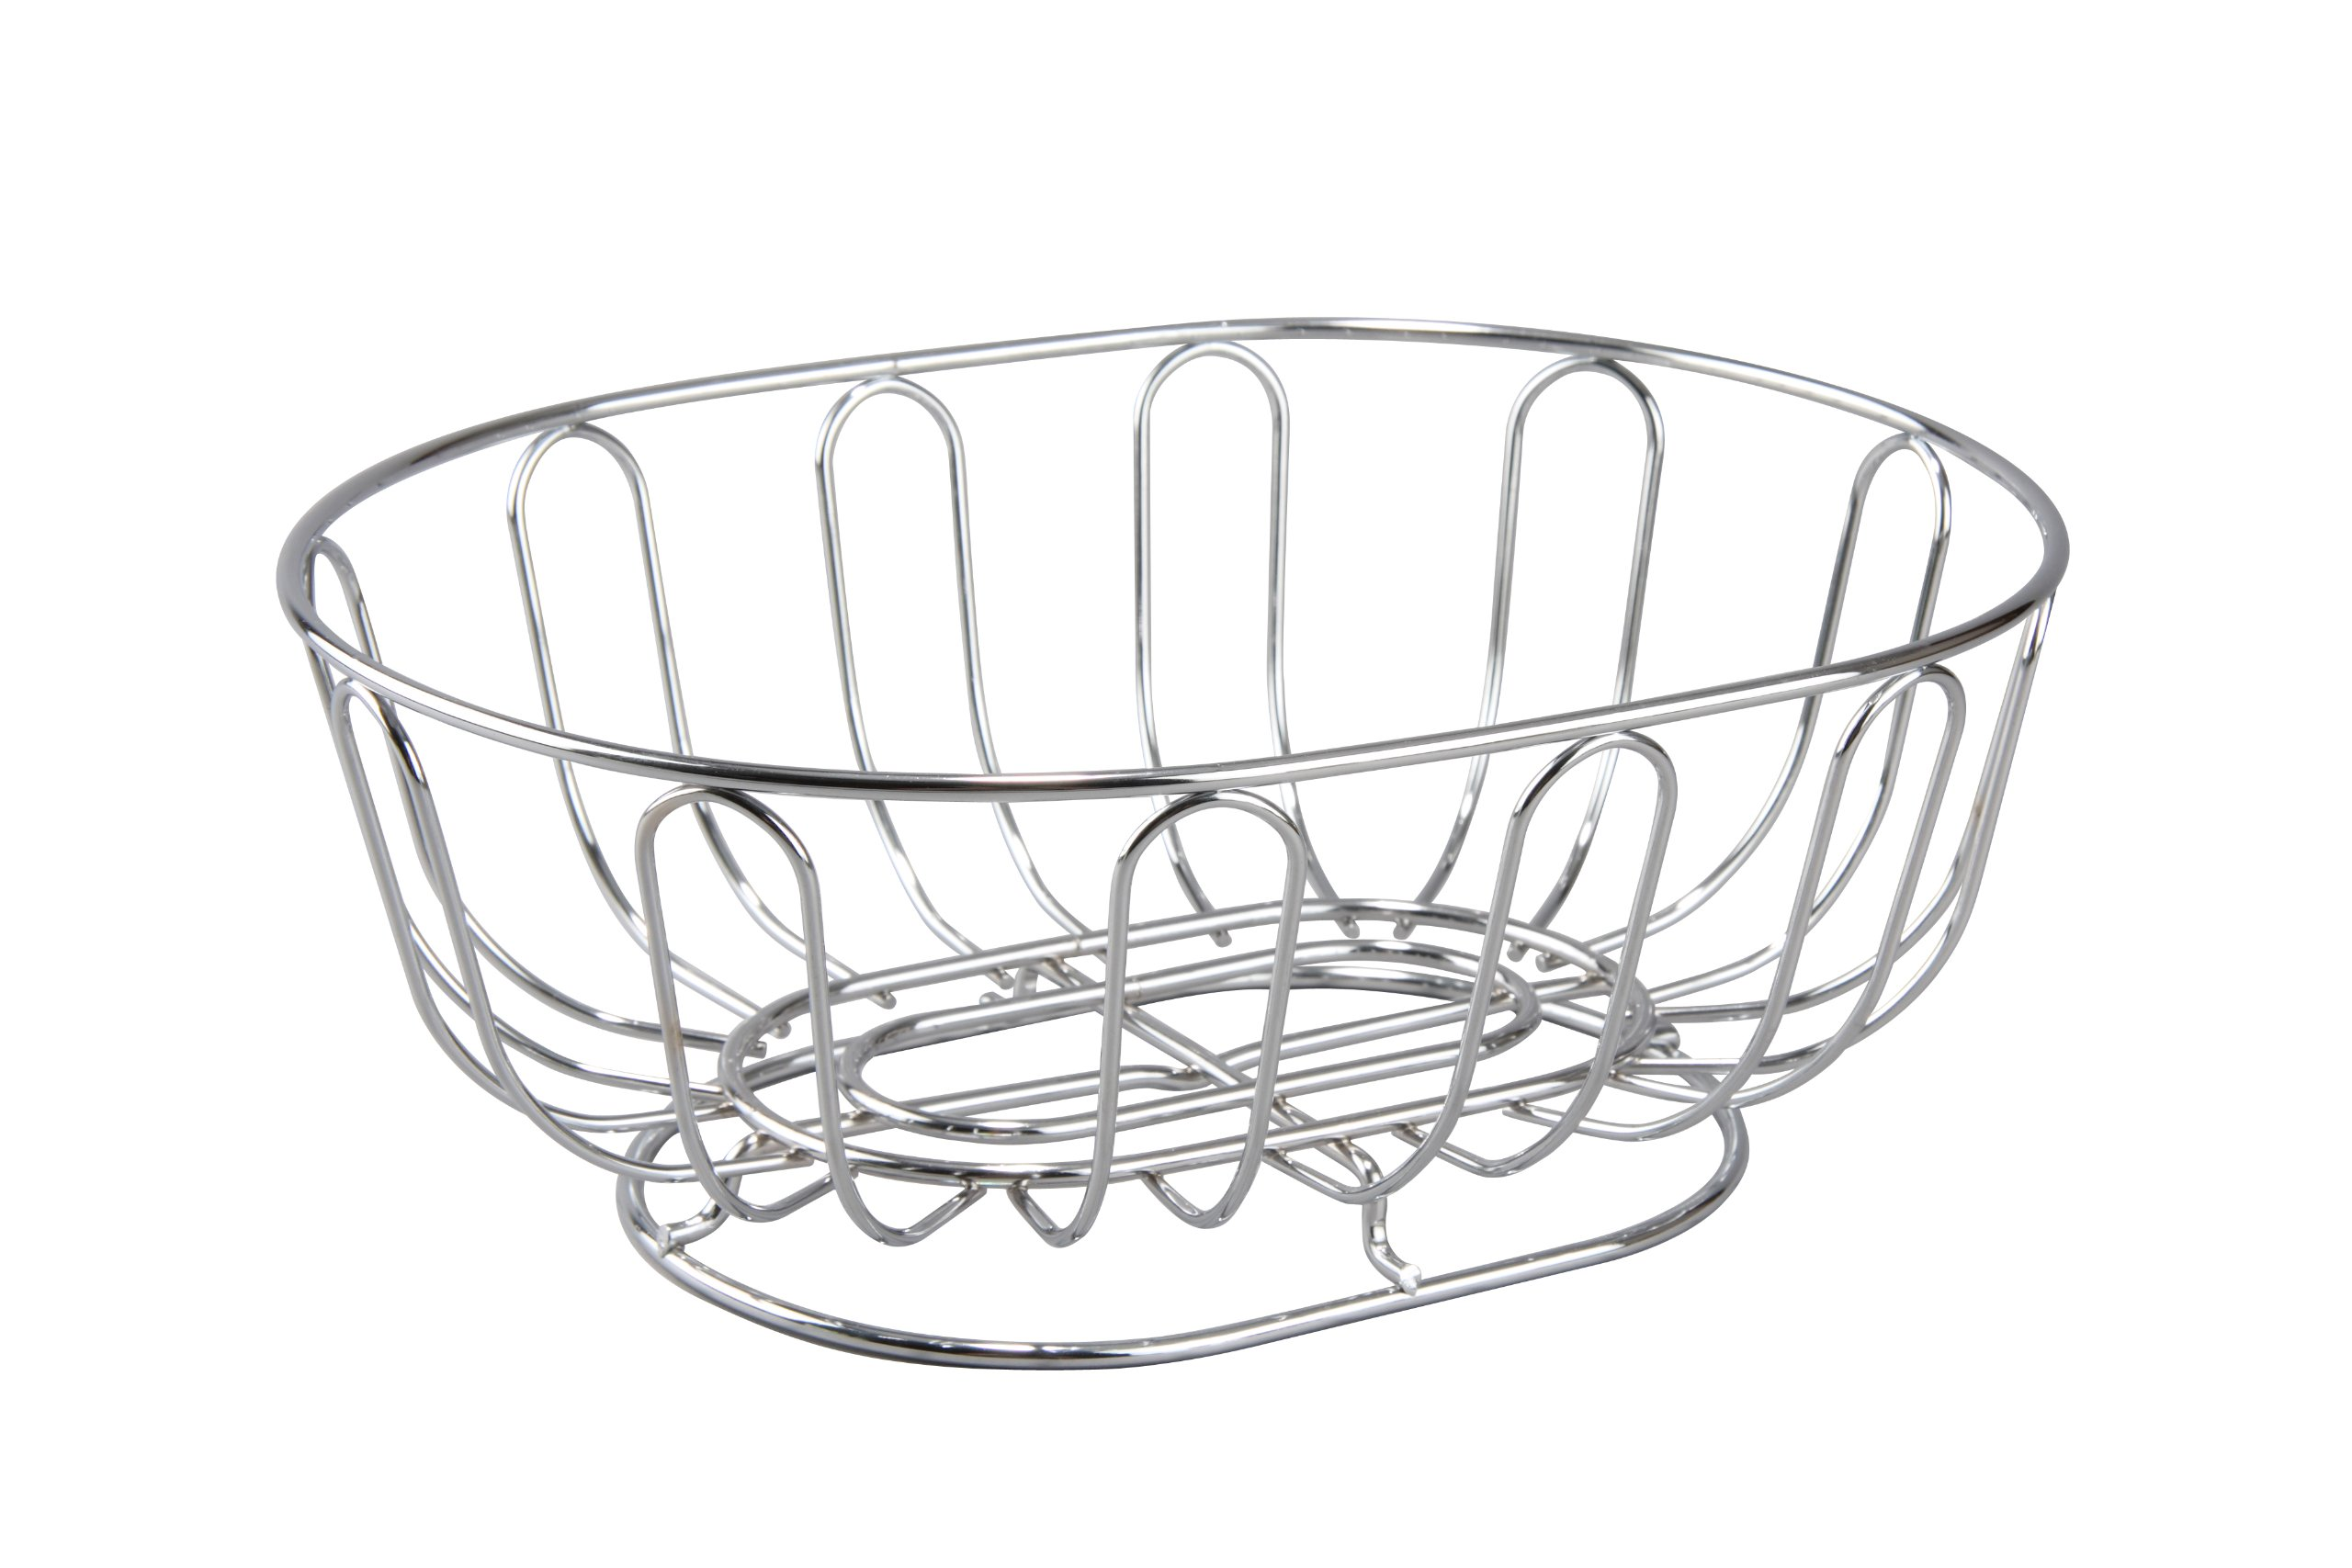 Cuisinox Oval Bread Basket/Fruit Bowl, Stainless Steel